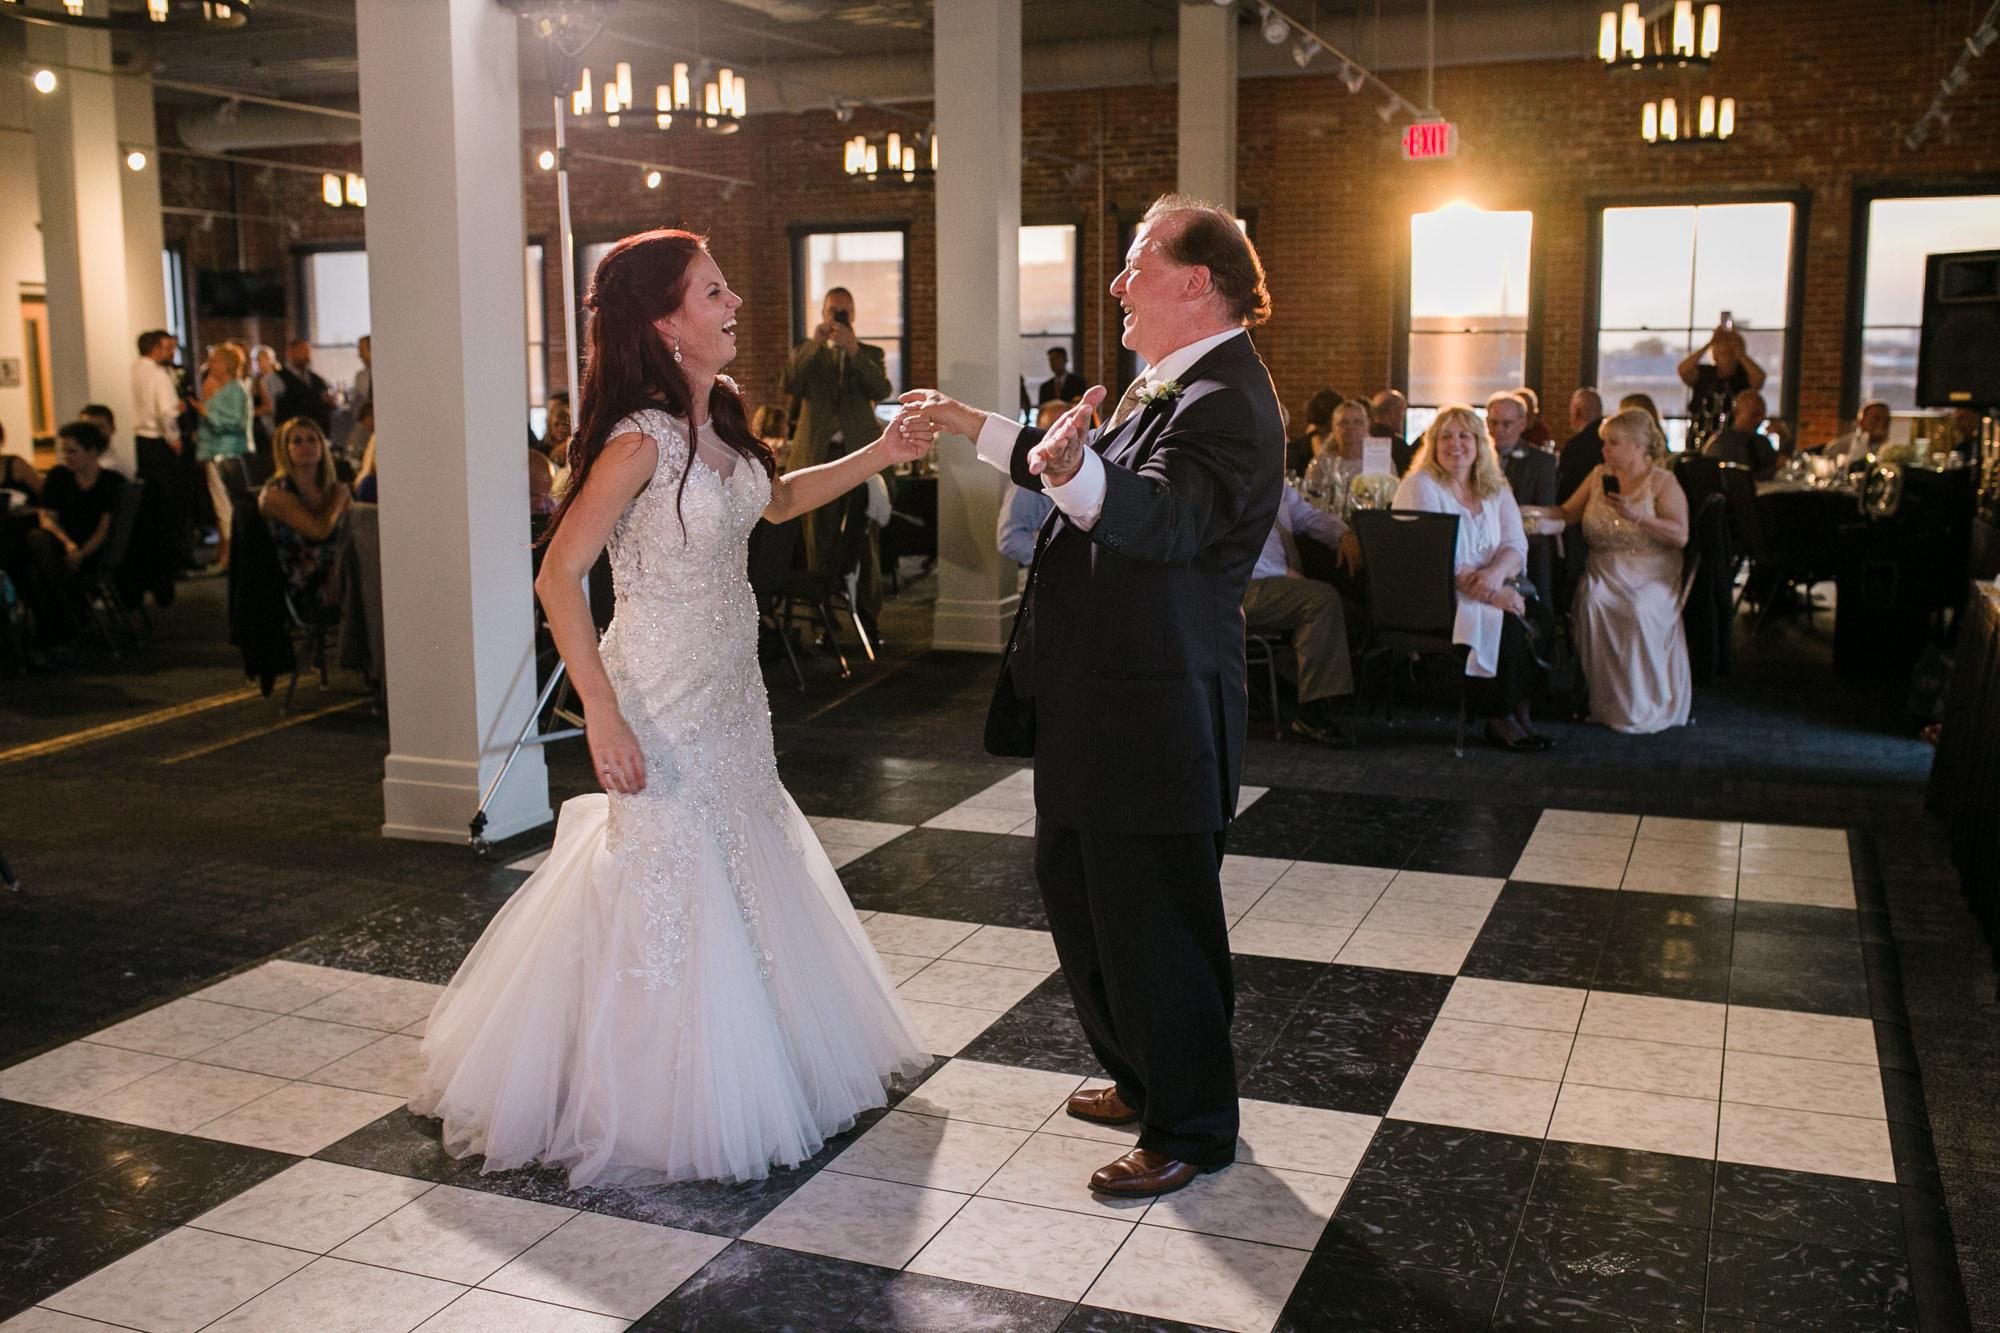 hensville-wedding-downtown-toledo-ohio (100 of 103).jpg